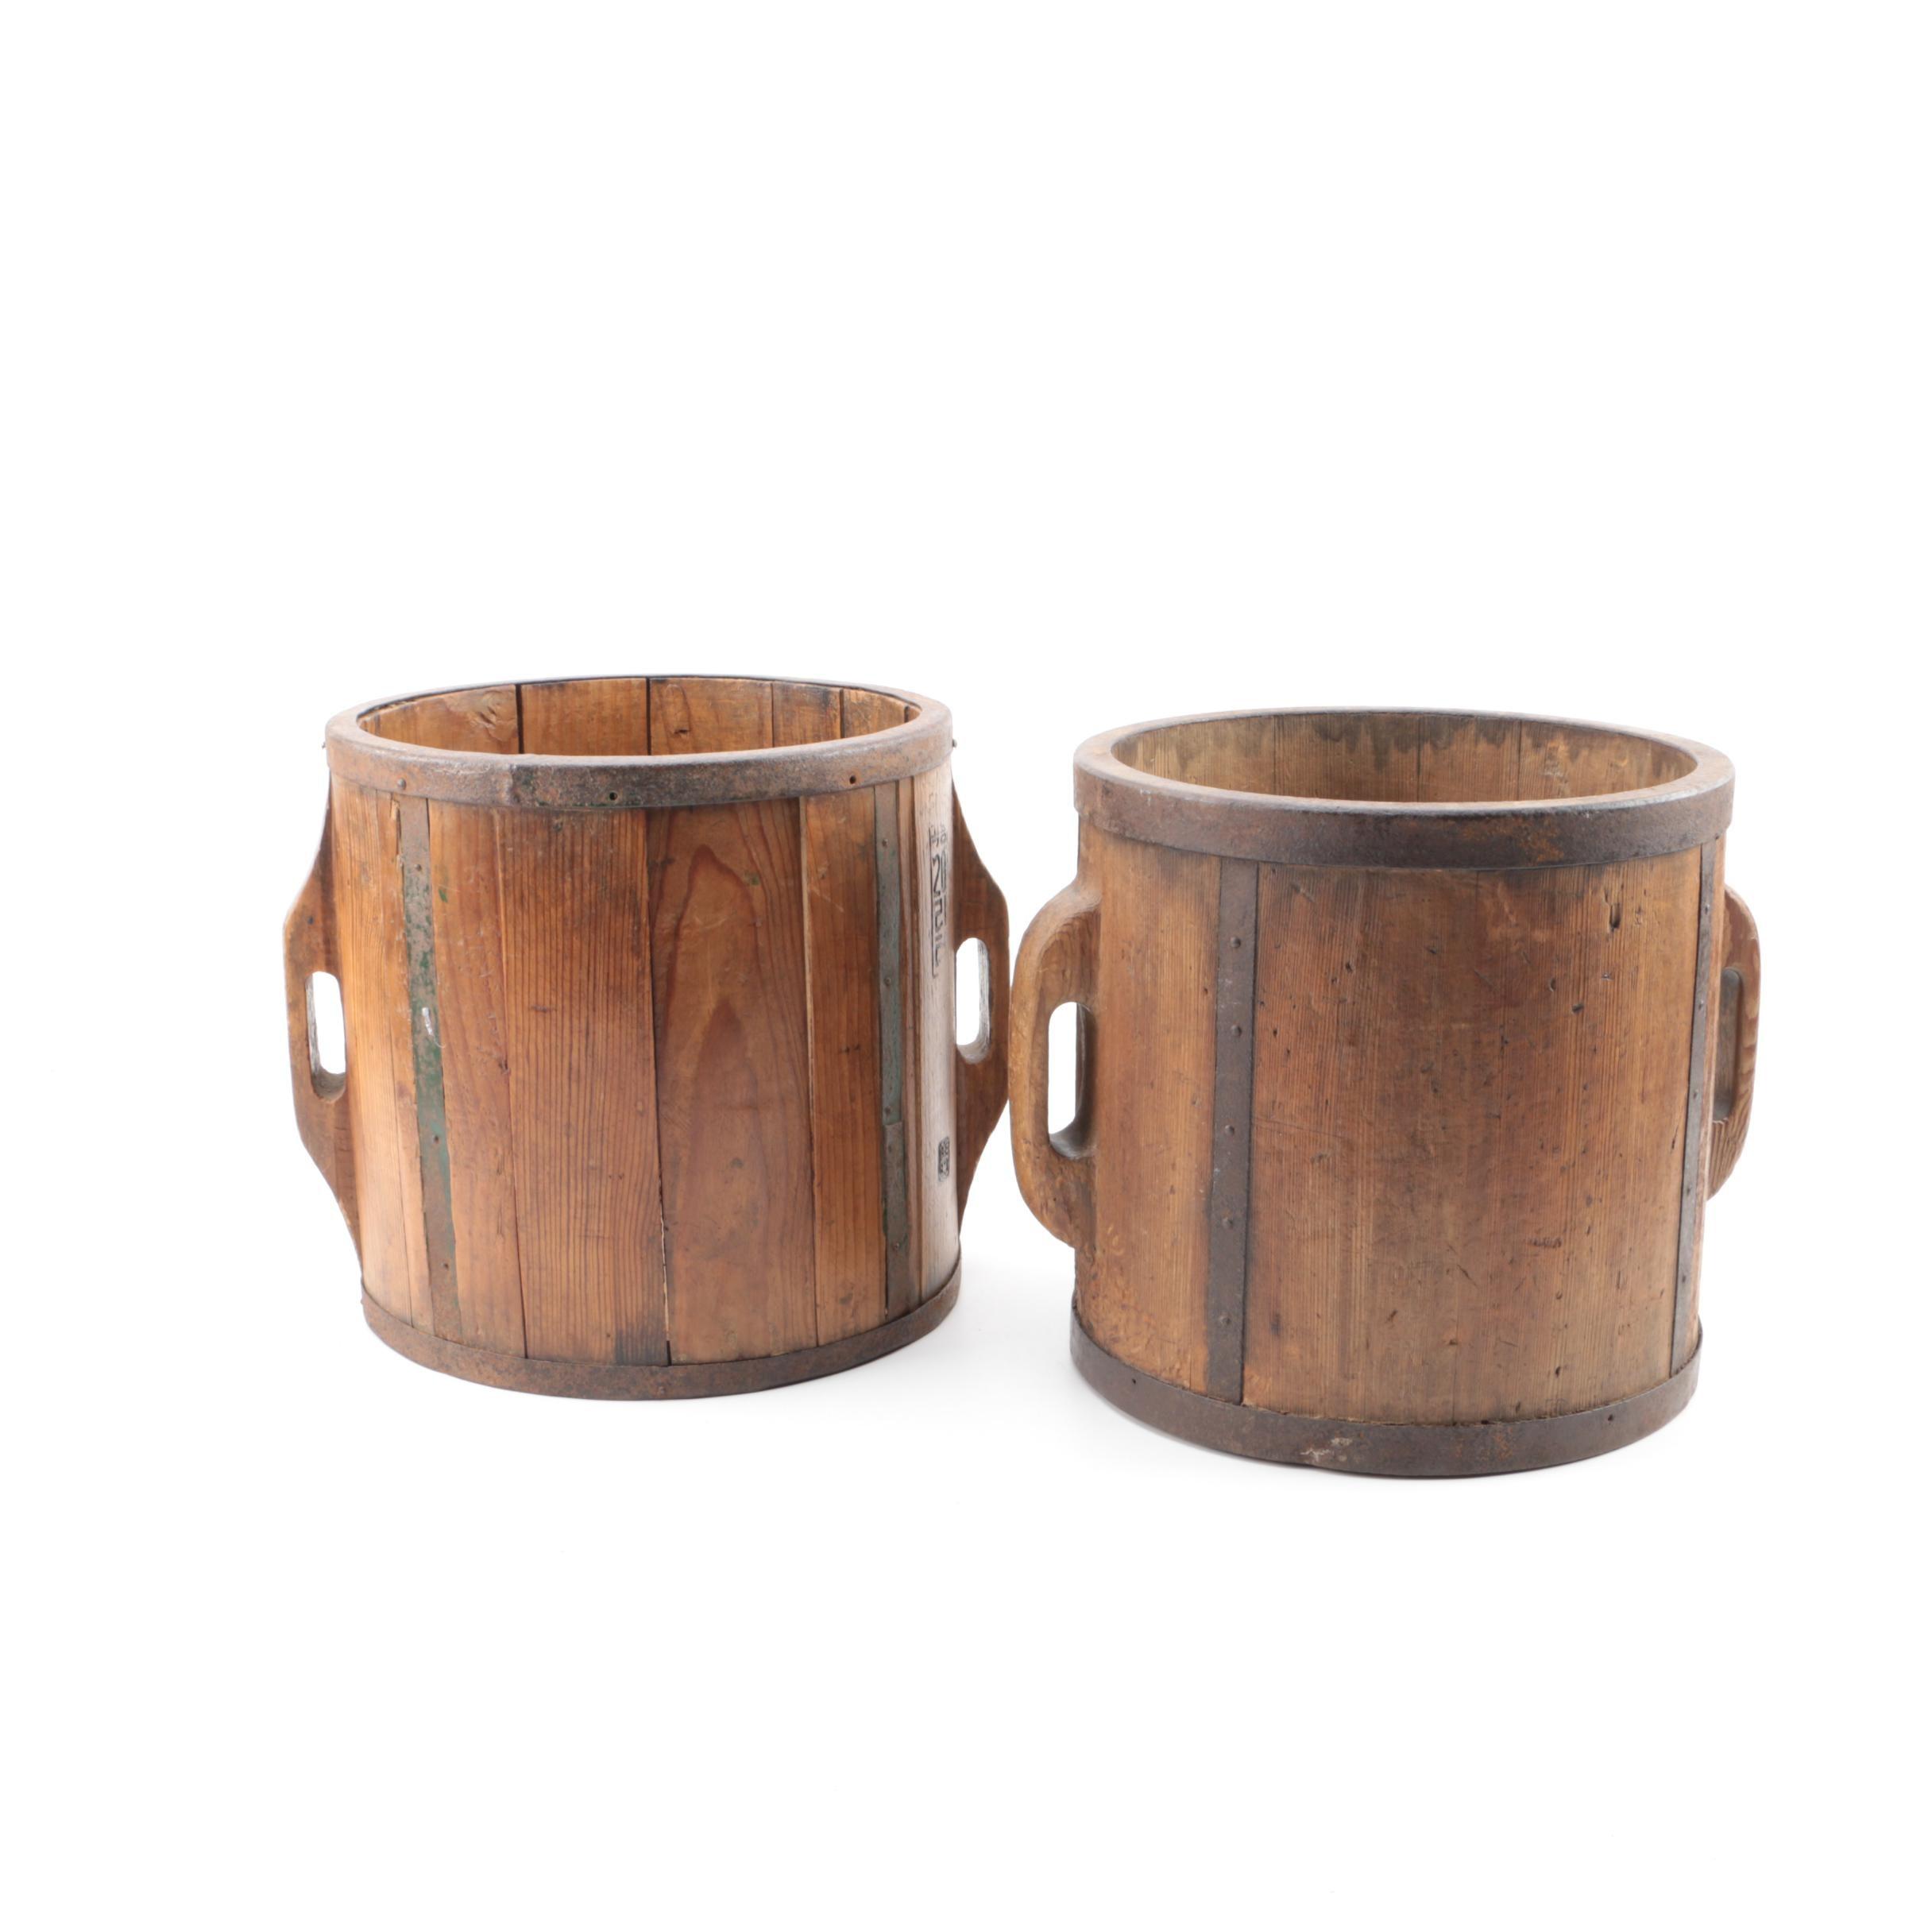 Japanese Wooden Rice Buckets